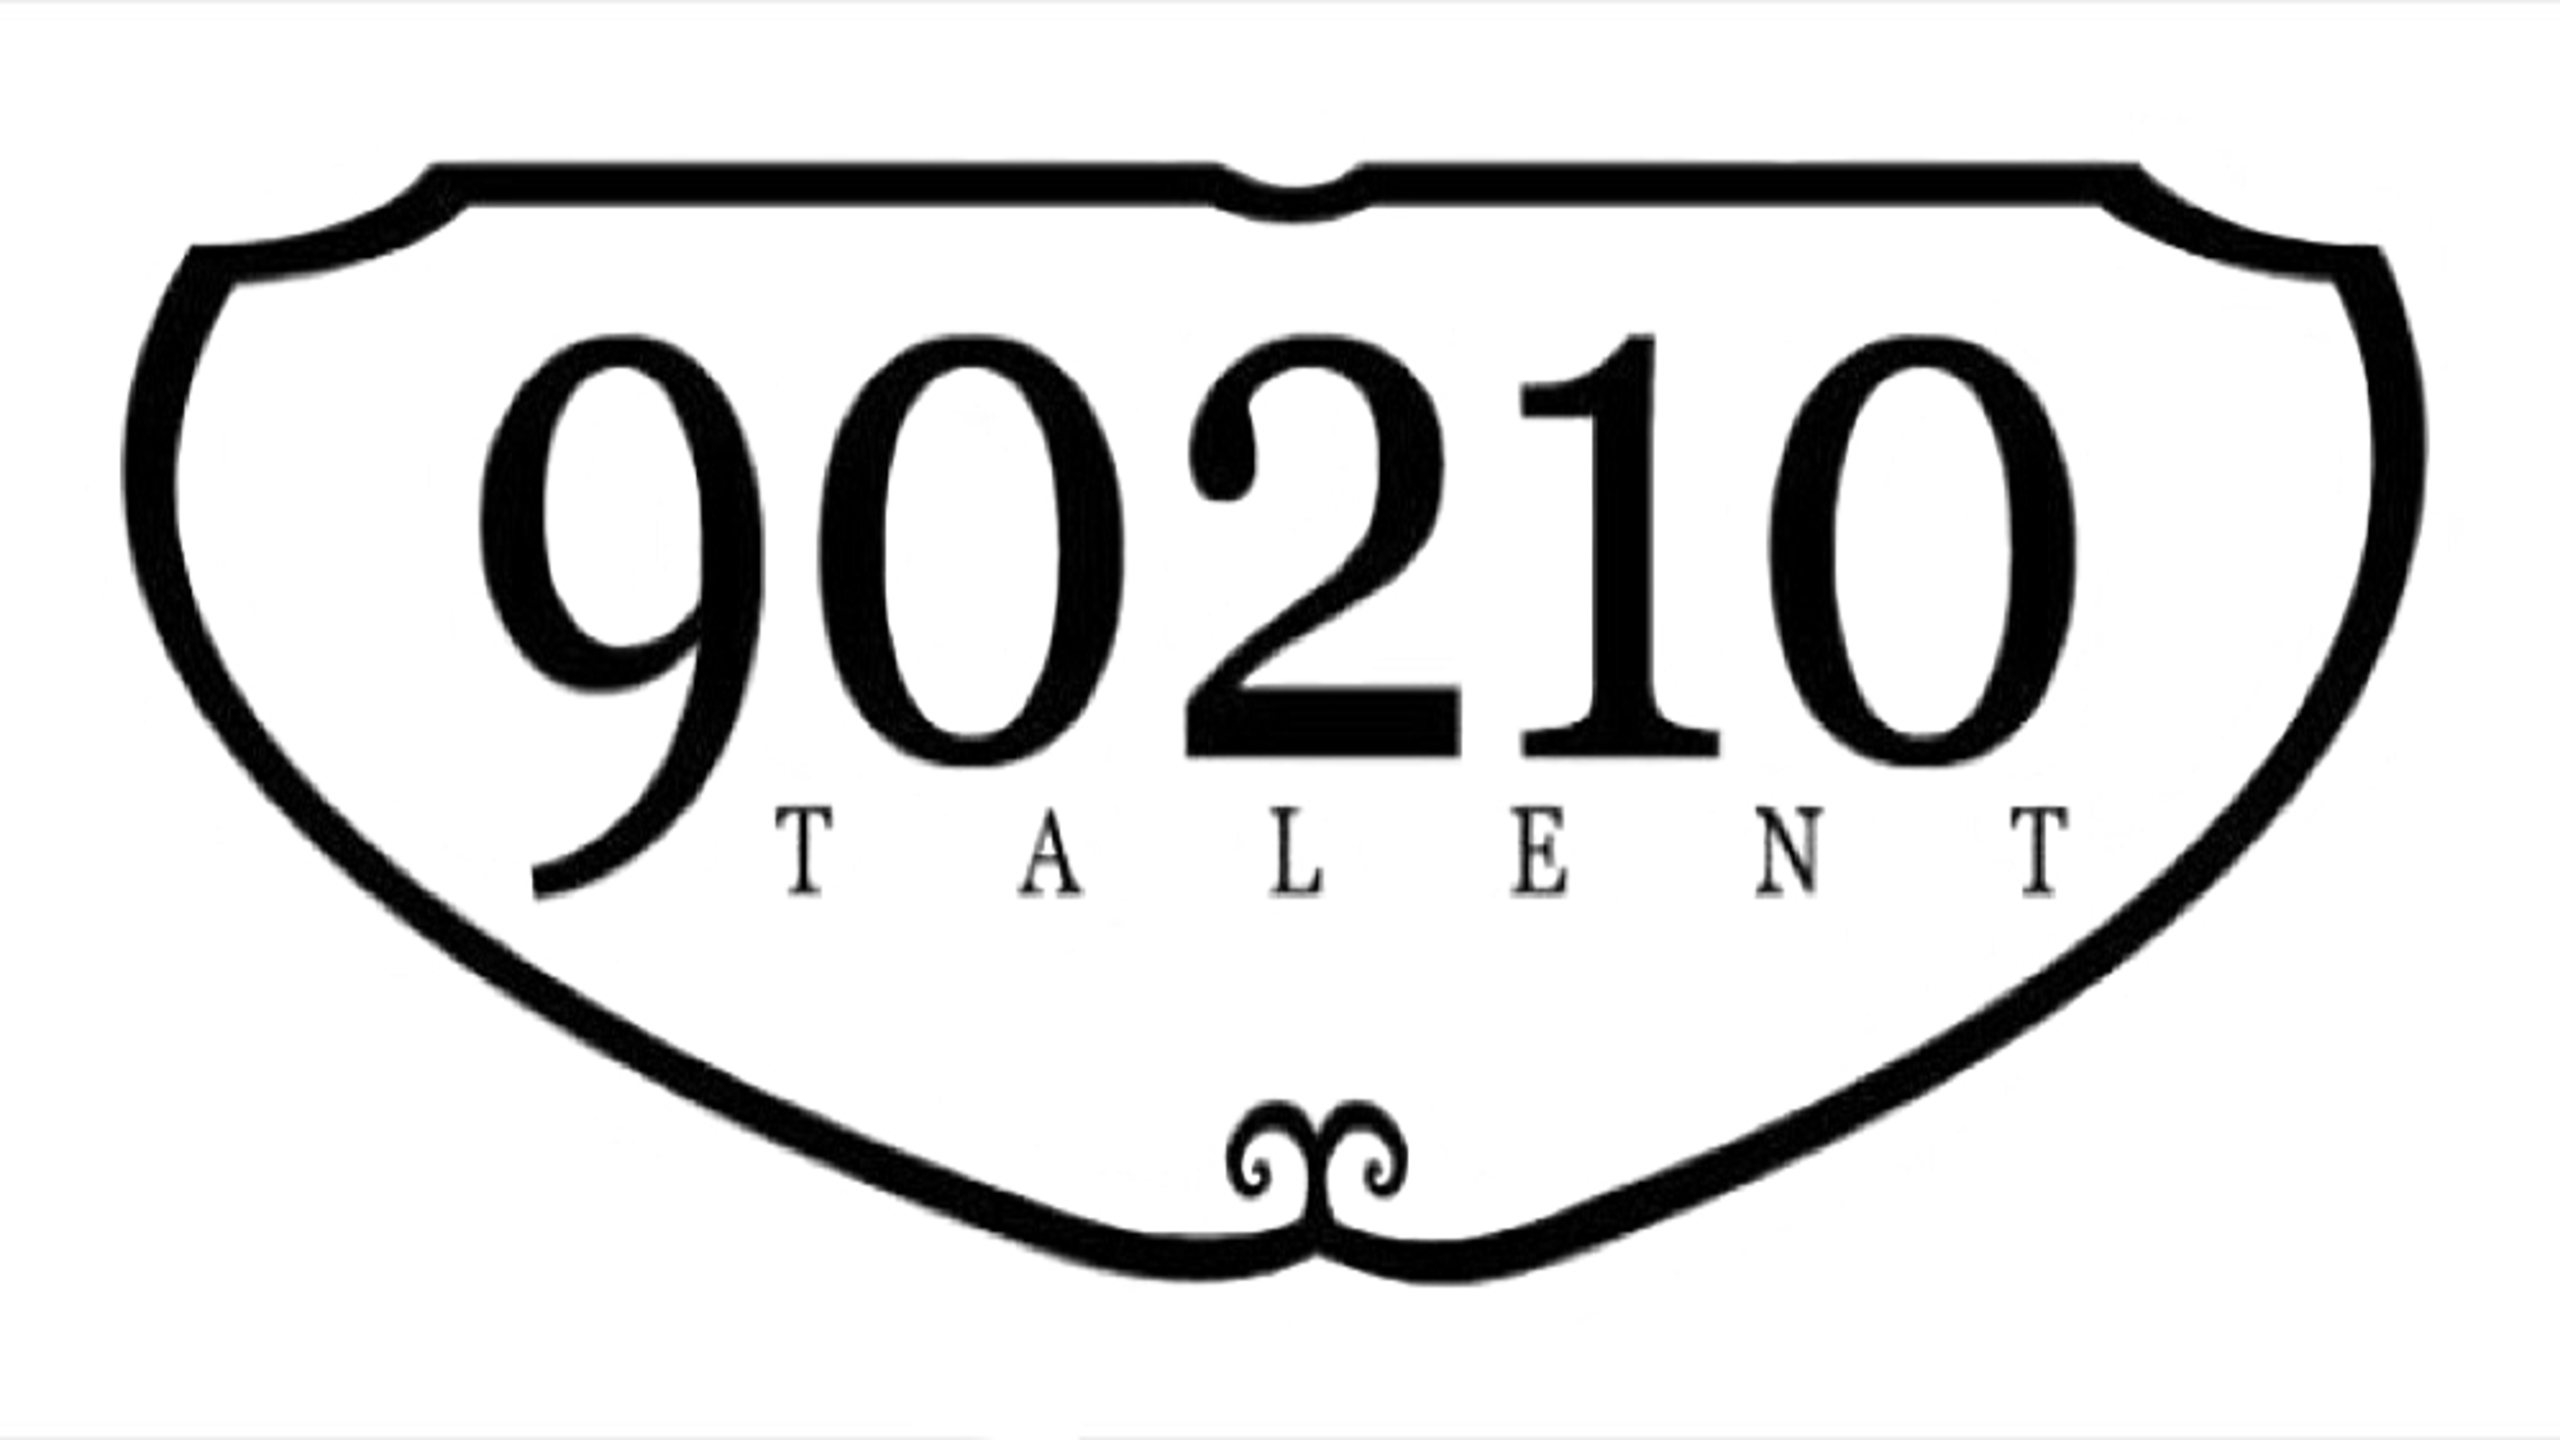 90210 TALENT LOGO - Jennifer Jiles